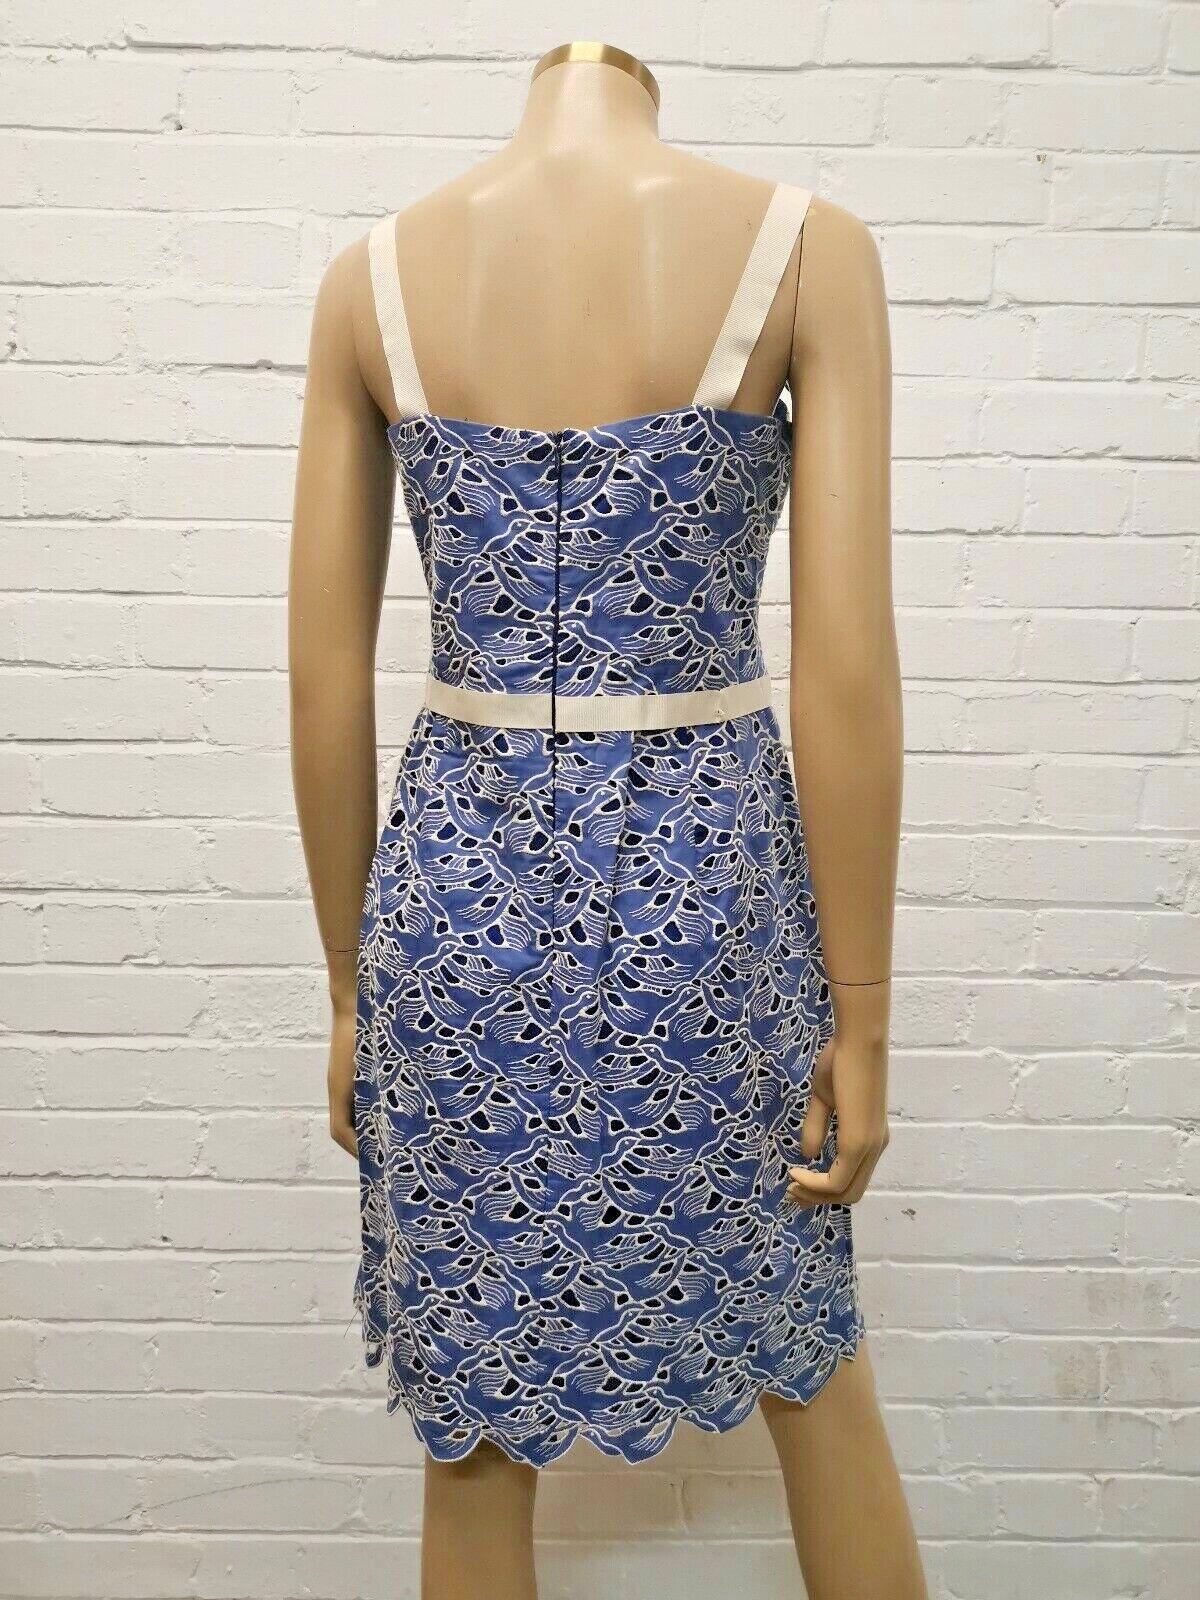 Maiochii Pretty Pastel Pastel Pastel Blau Cotton Day Dress UK 10 f660d4